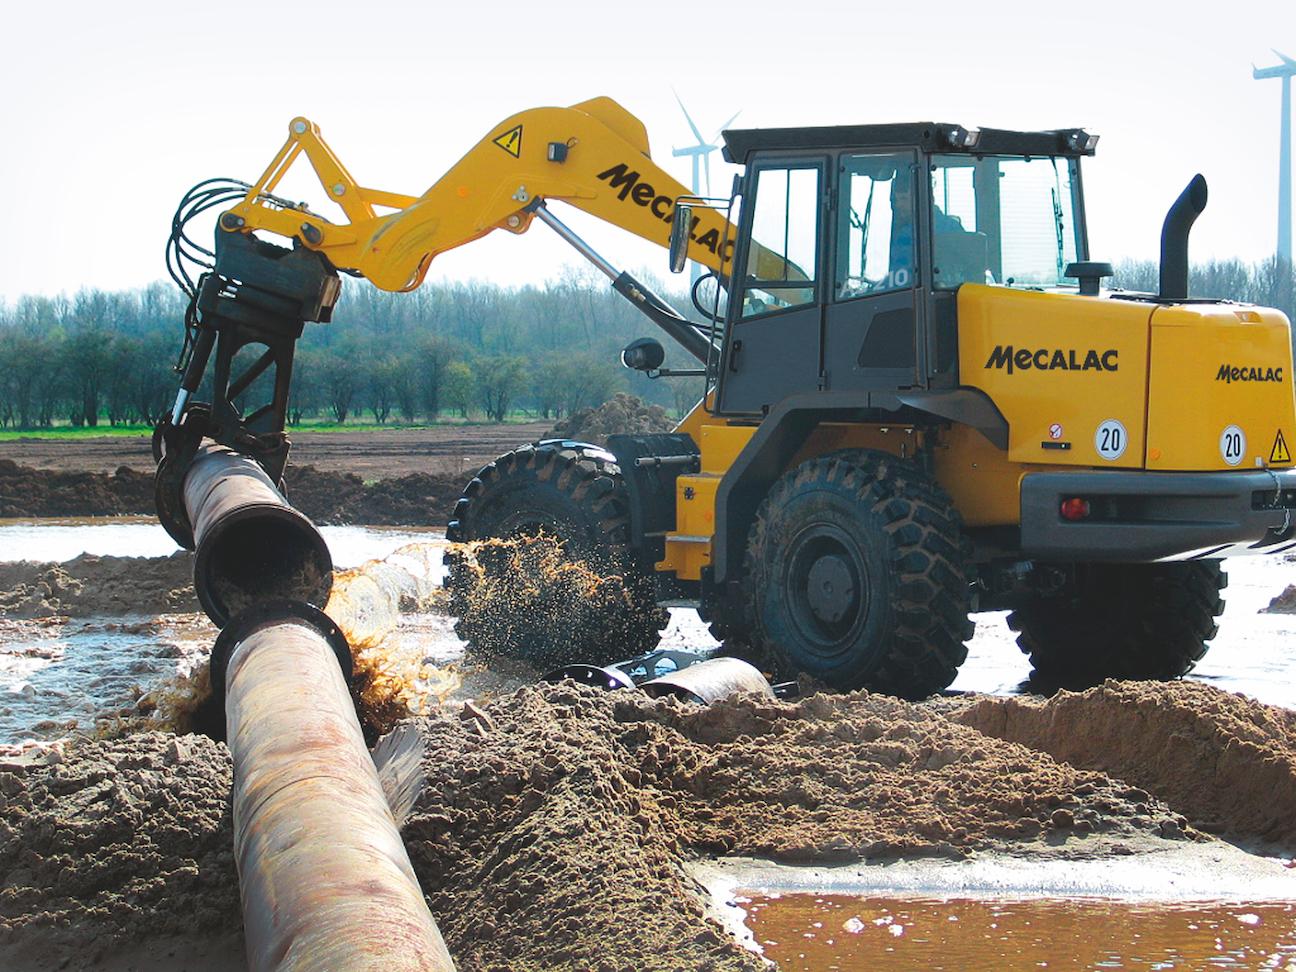 Mecalac AS210e wheel loader laying pipe